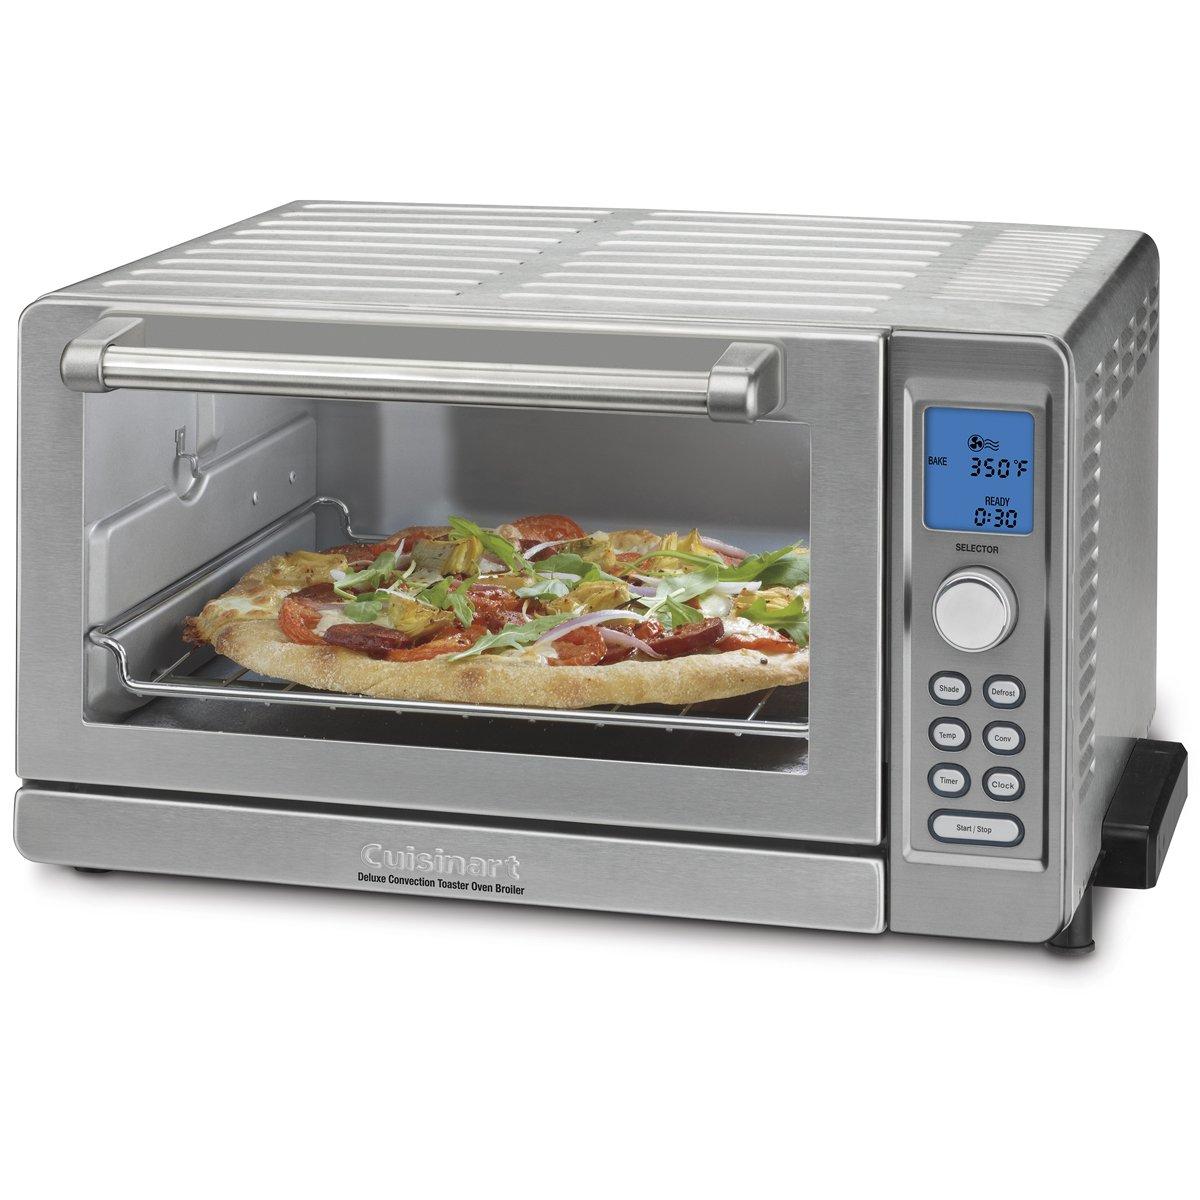 dp com deluxe oven tob toaster white convection amazon cuisinart ac broiler